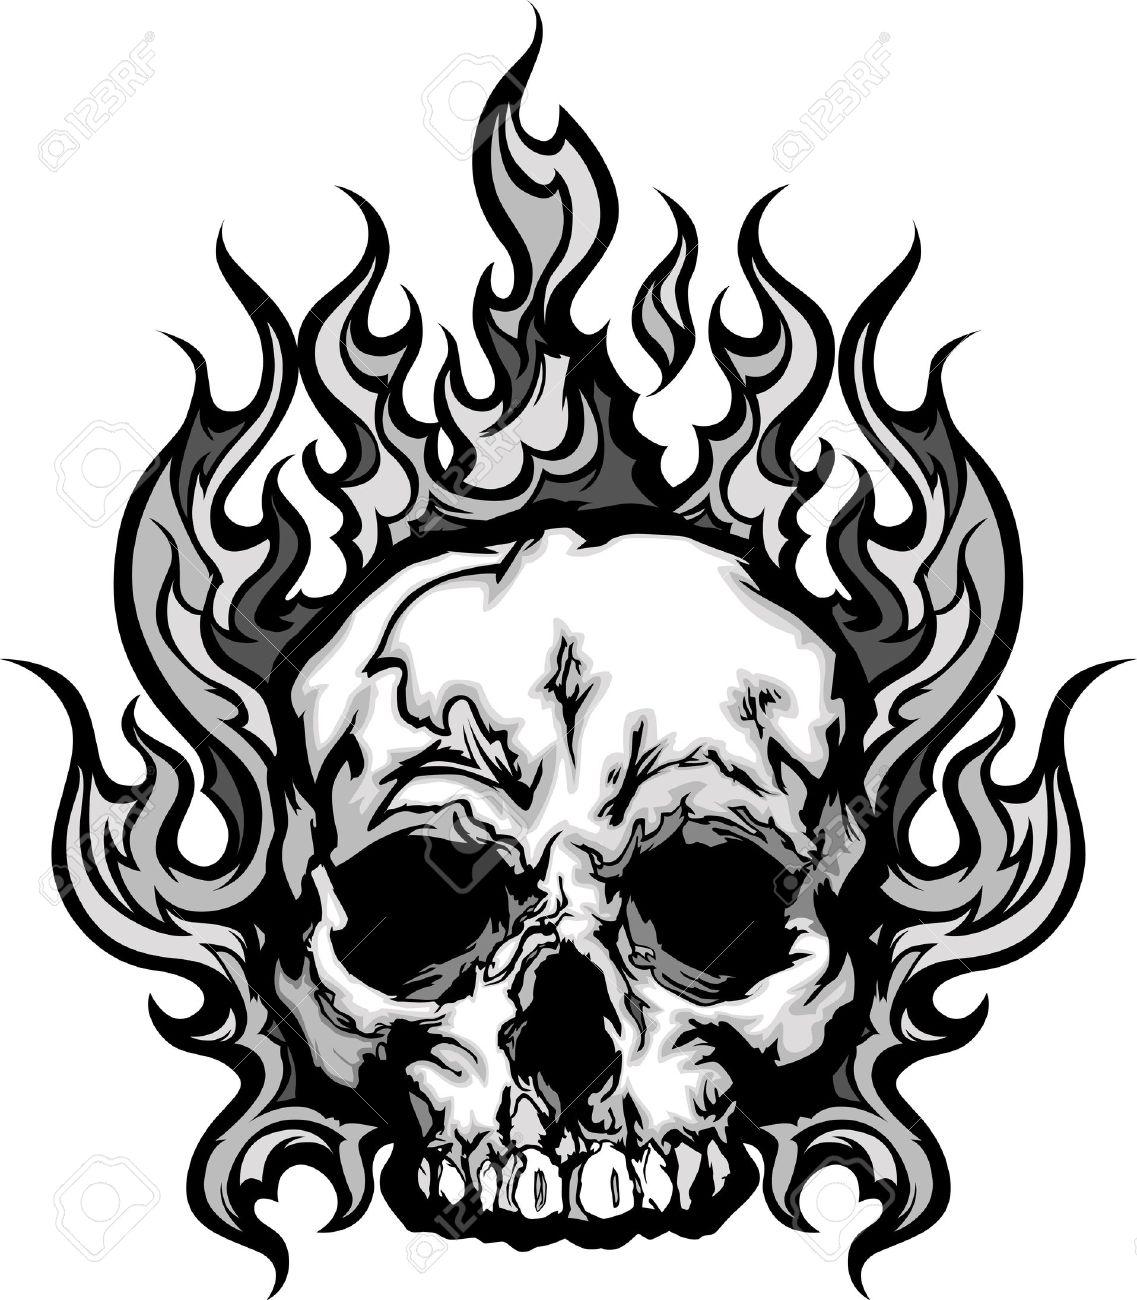 1137x1300 Breakthrough Coloring Pages Skulls Flames Skul